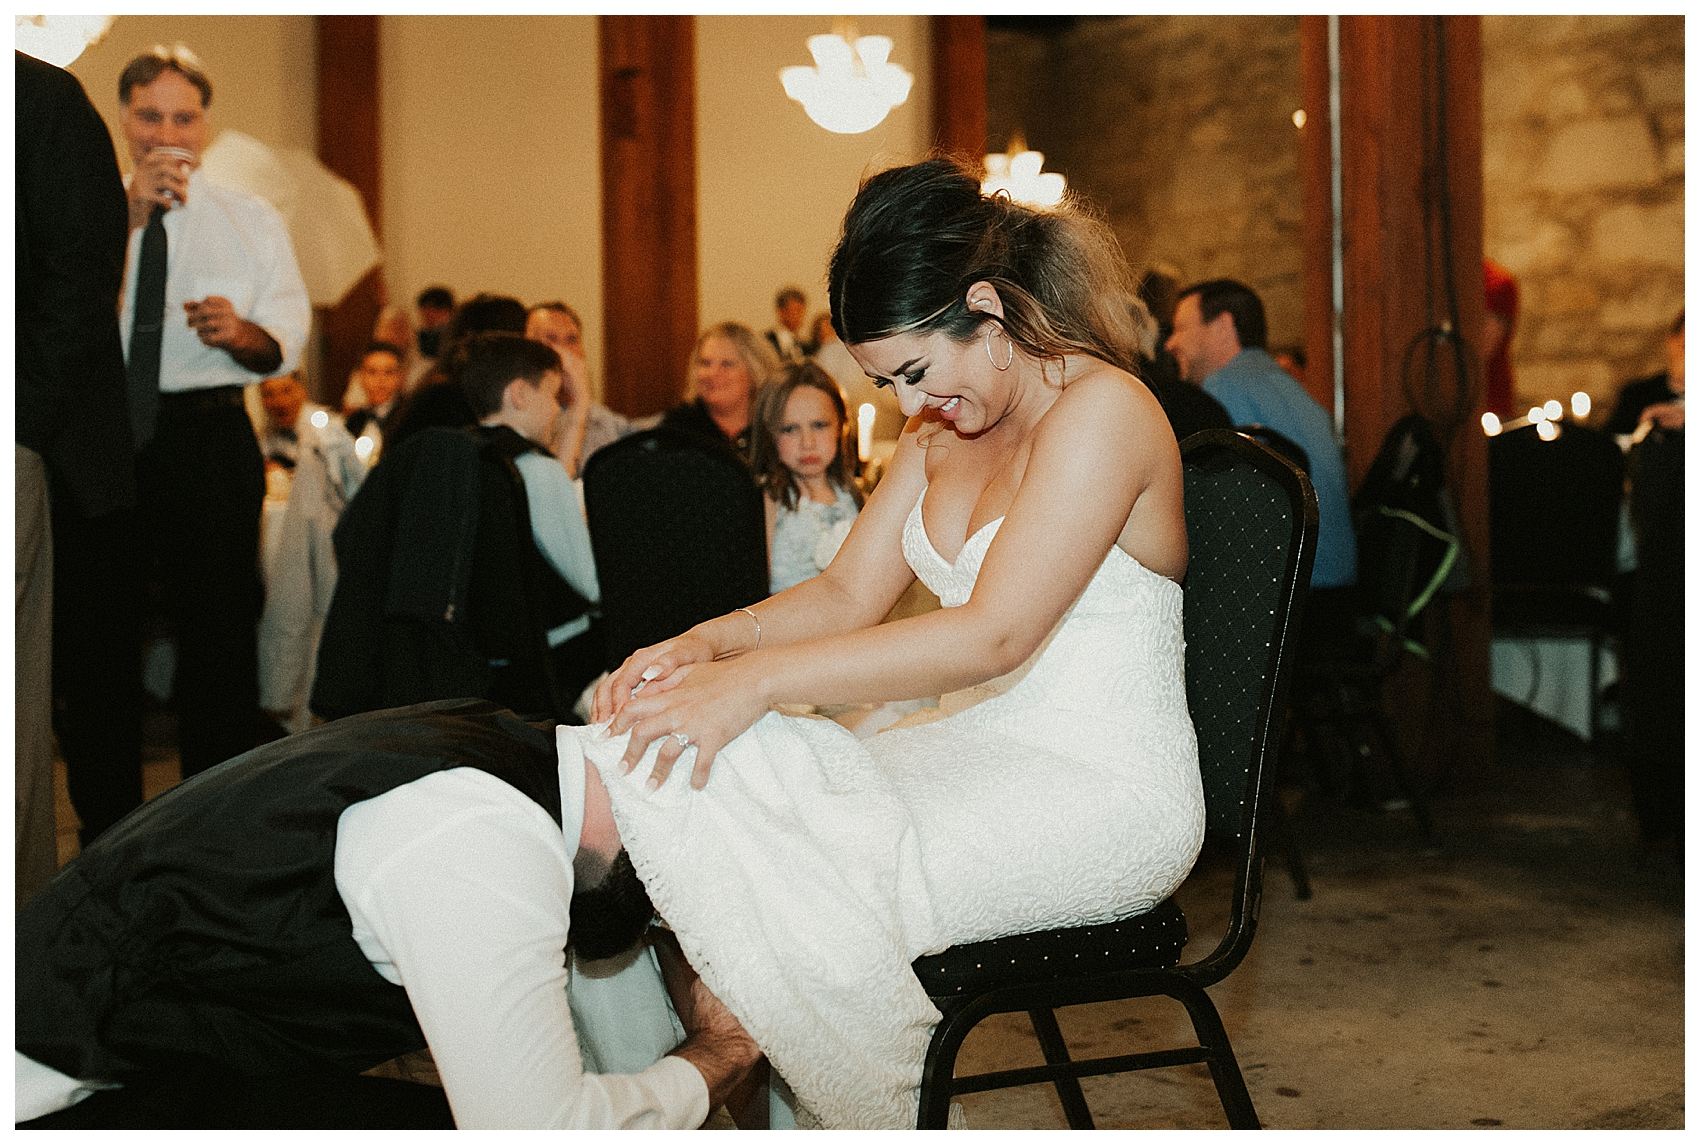 Chateau Rive Spokane Wedding Cassie Trottier Photography01109.jpg